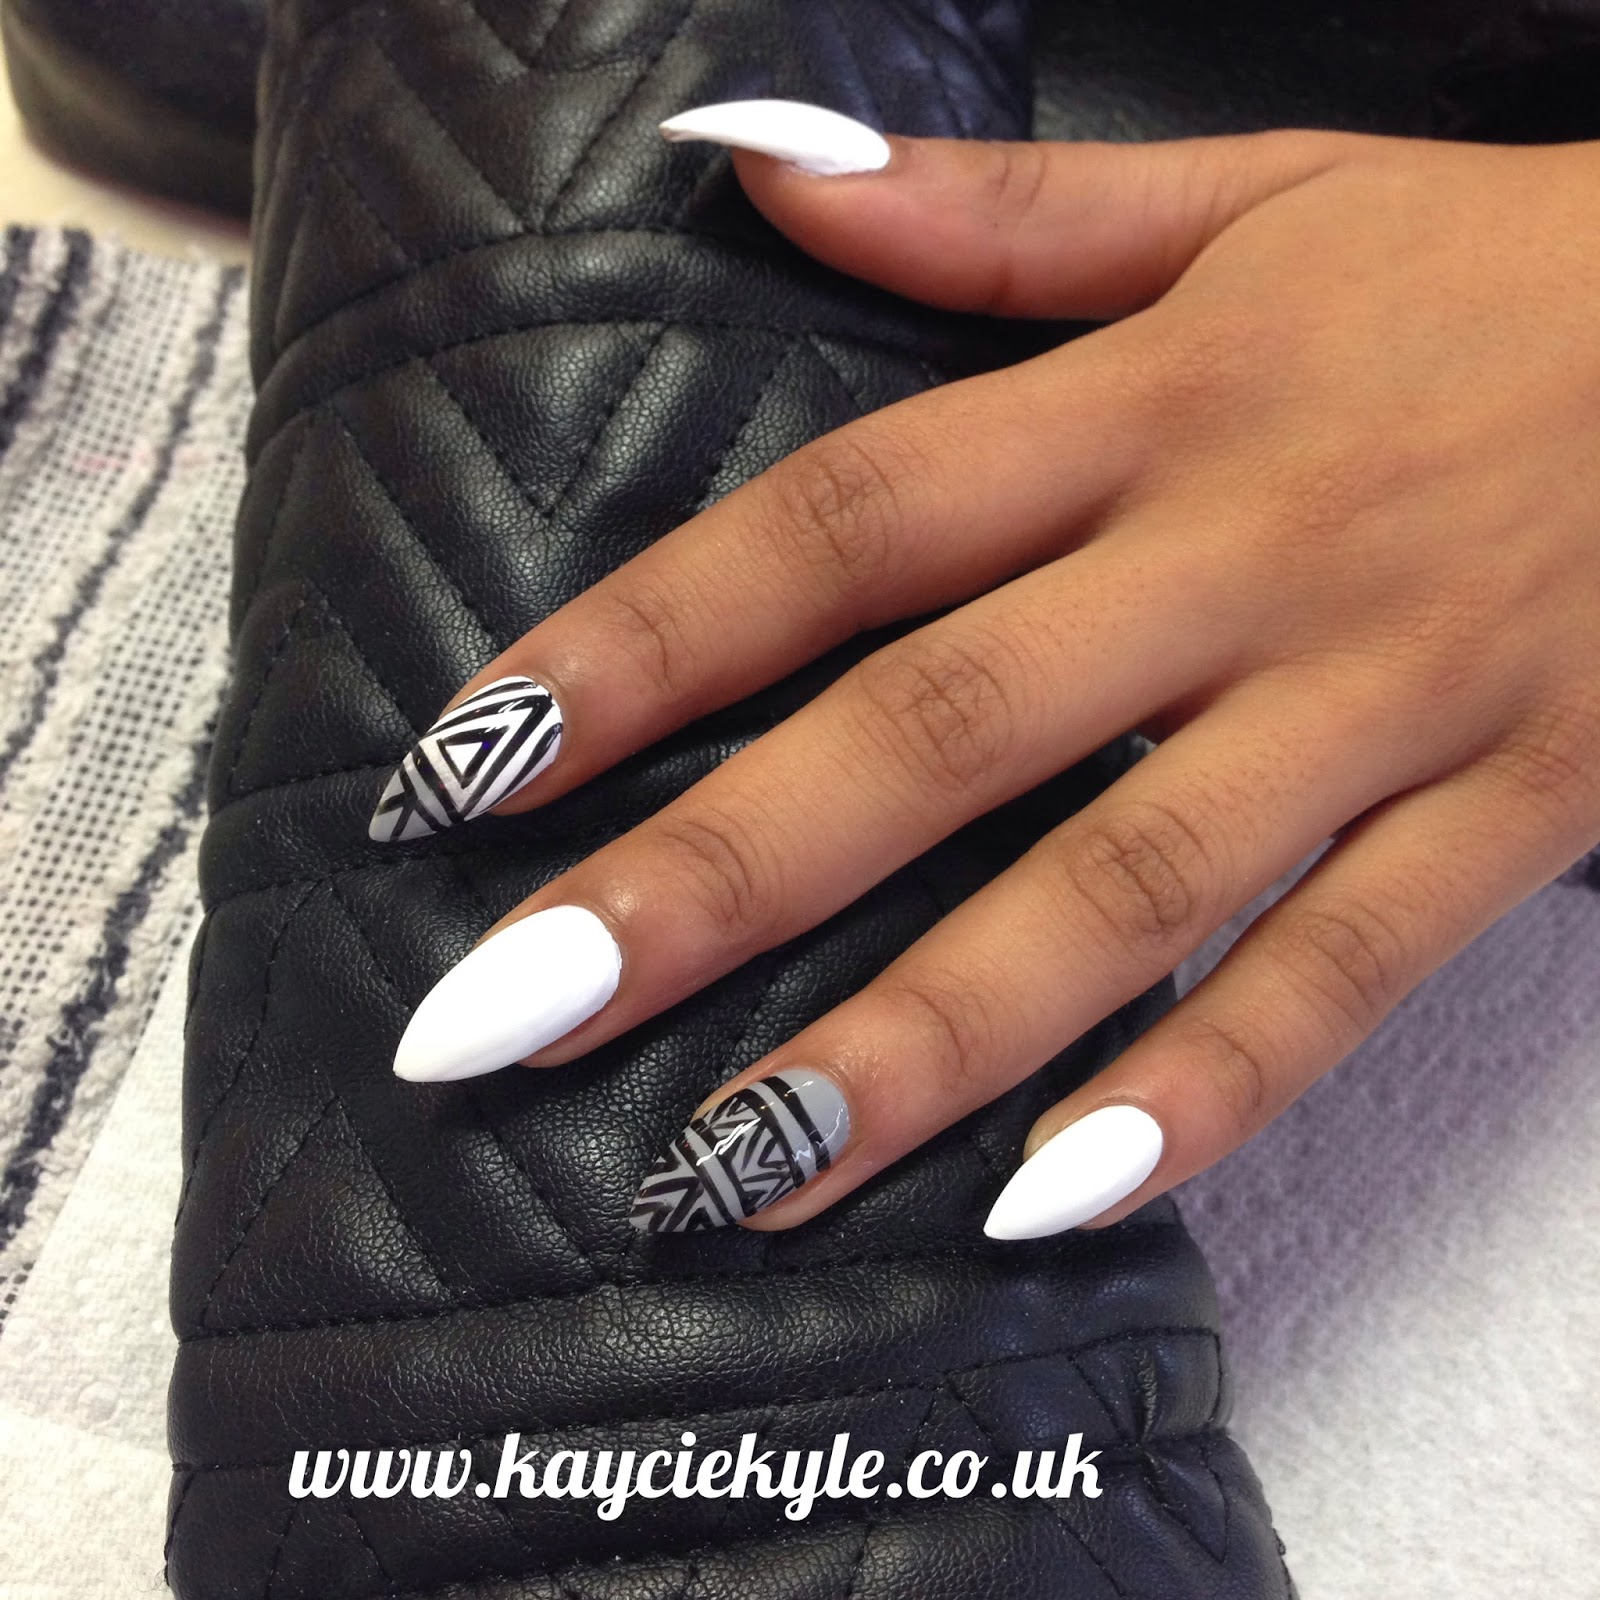 Best Nails: Kaycie Kyle